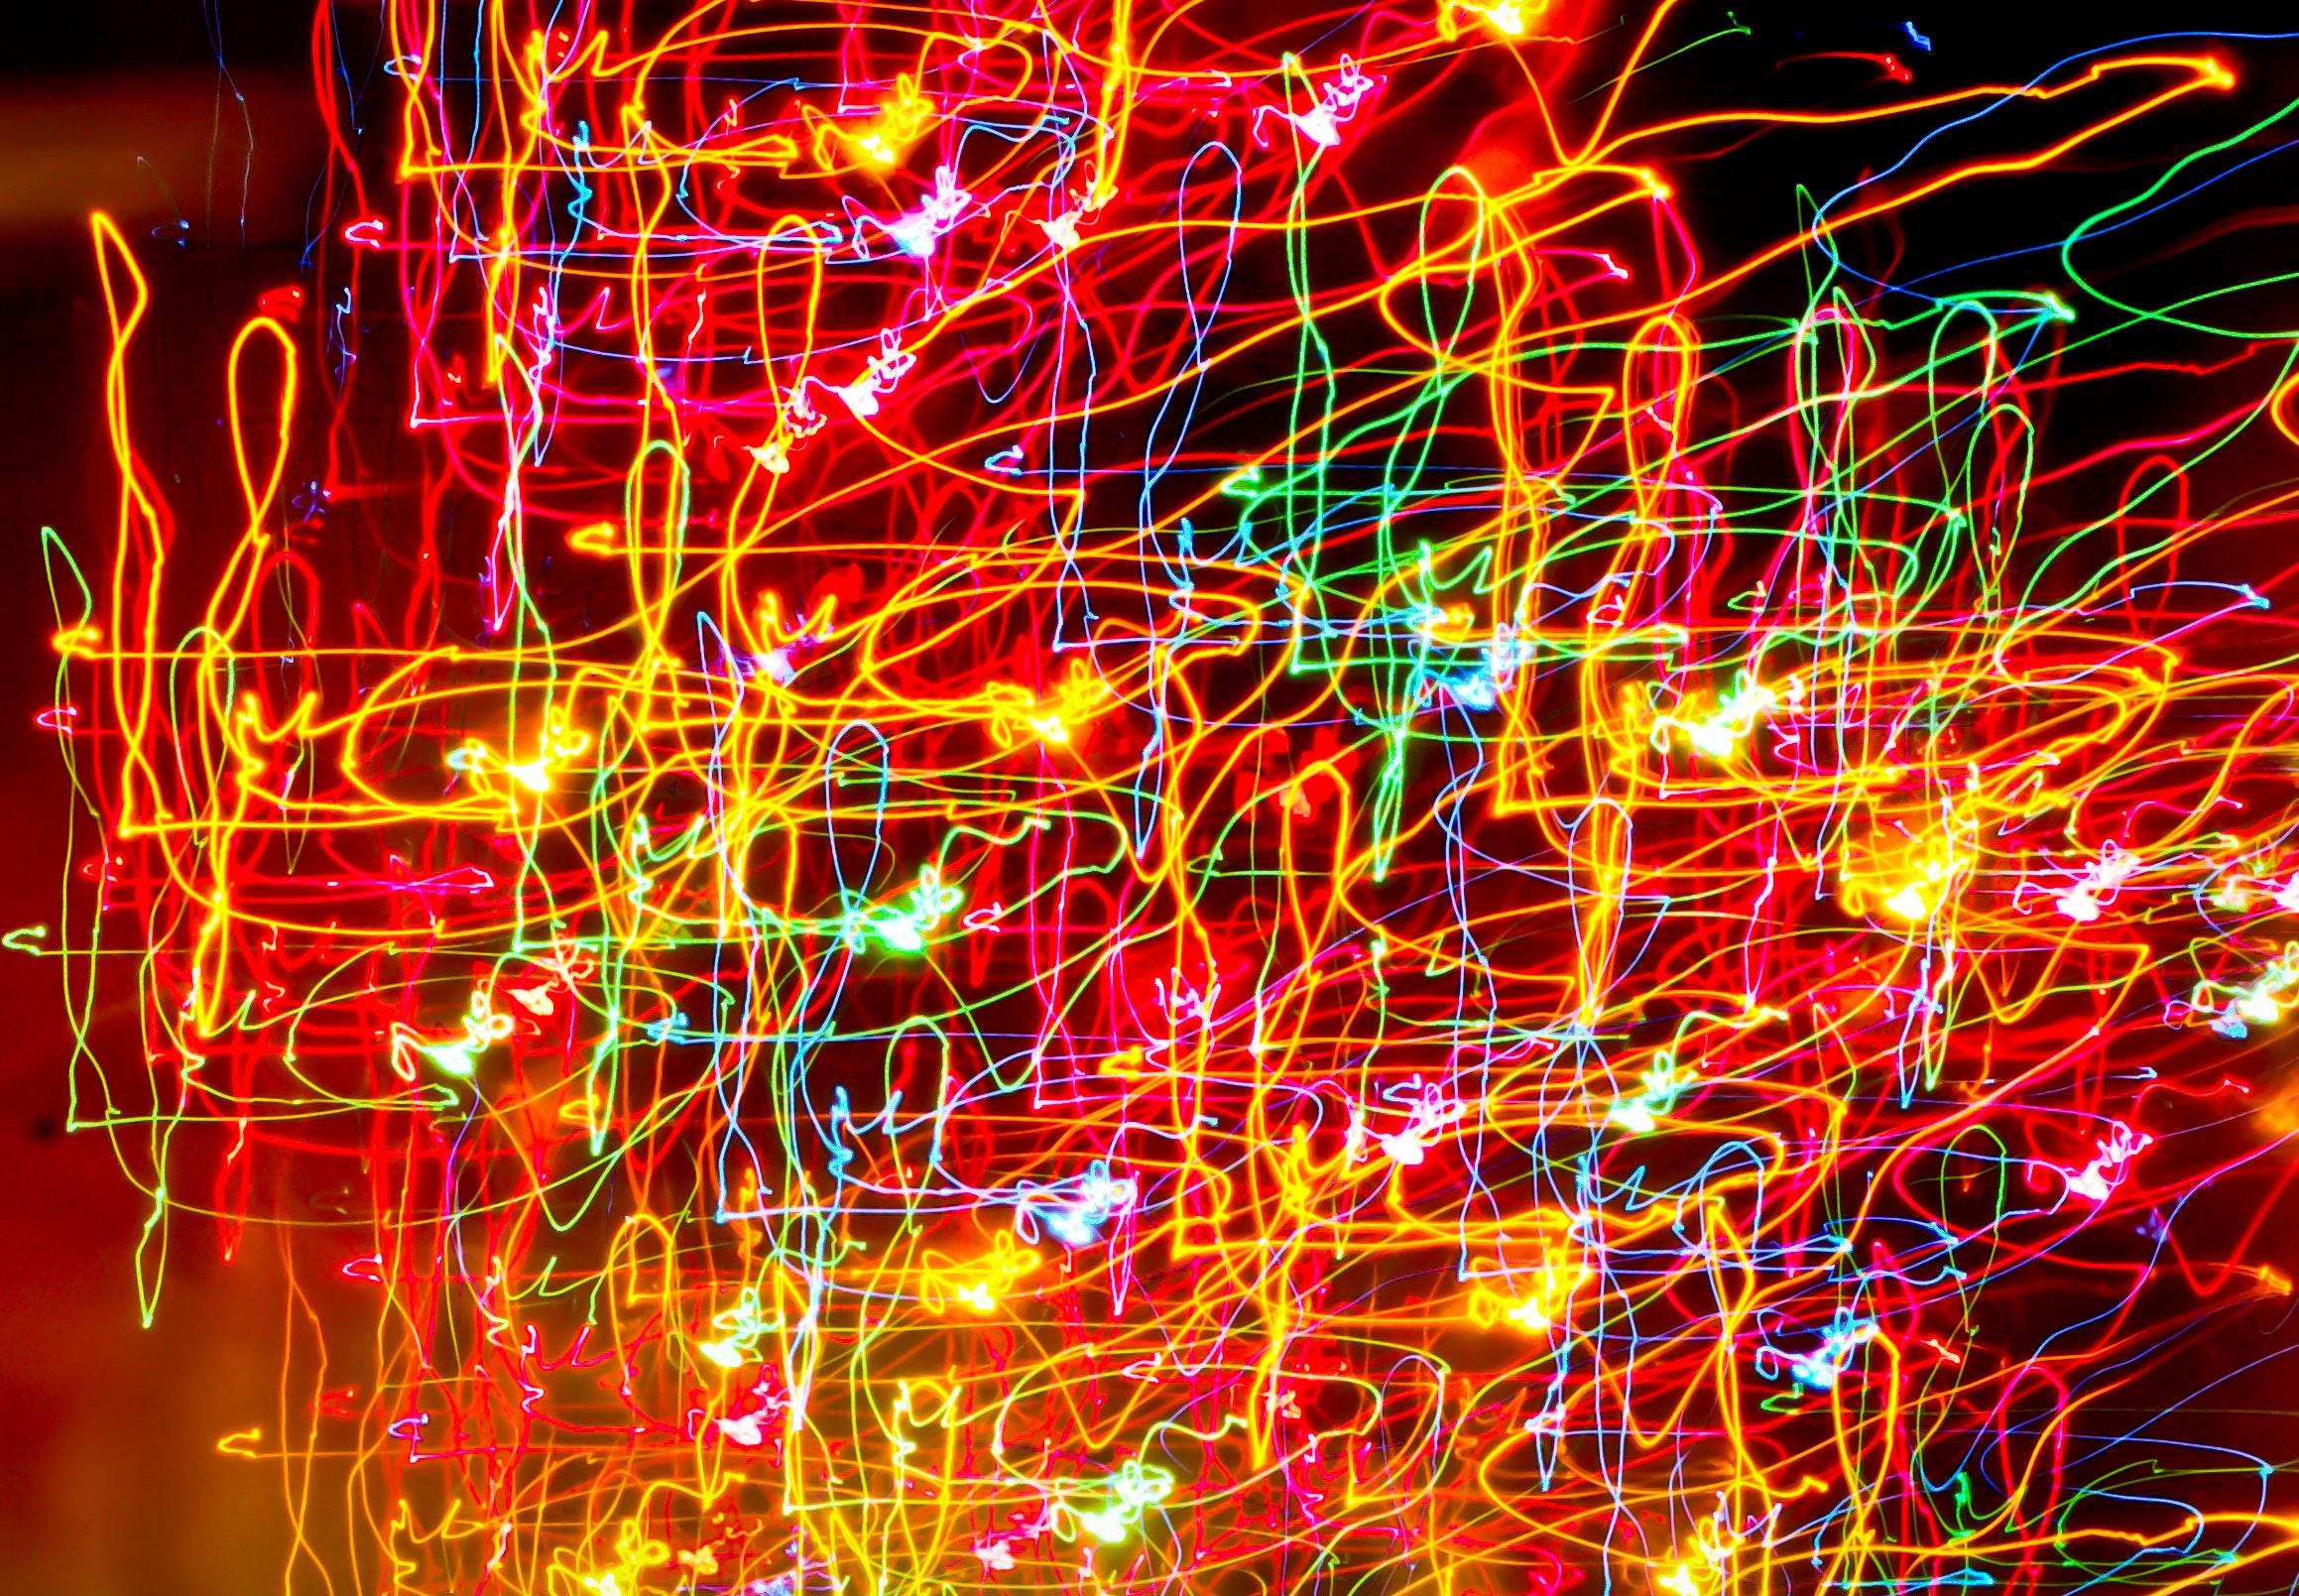 1000+ Interesting Colorful Photos · Pexels · Free Stock Photos